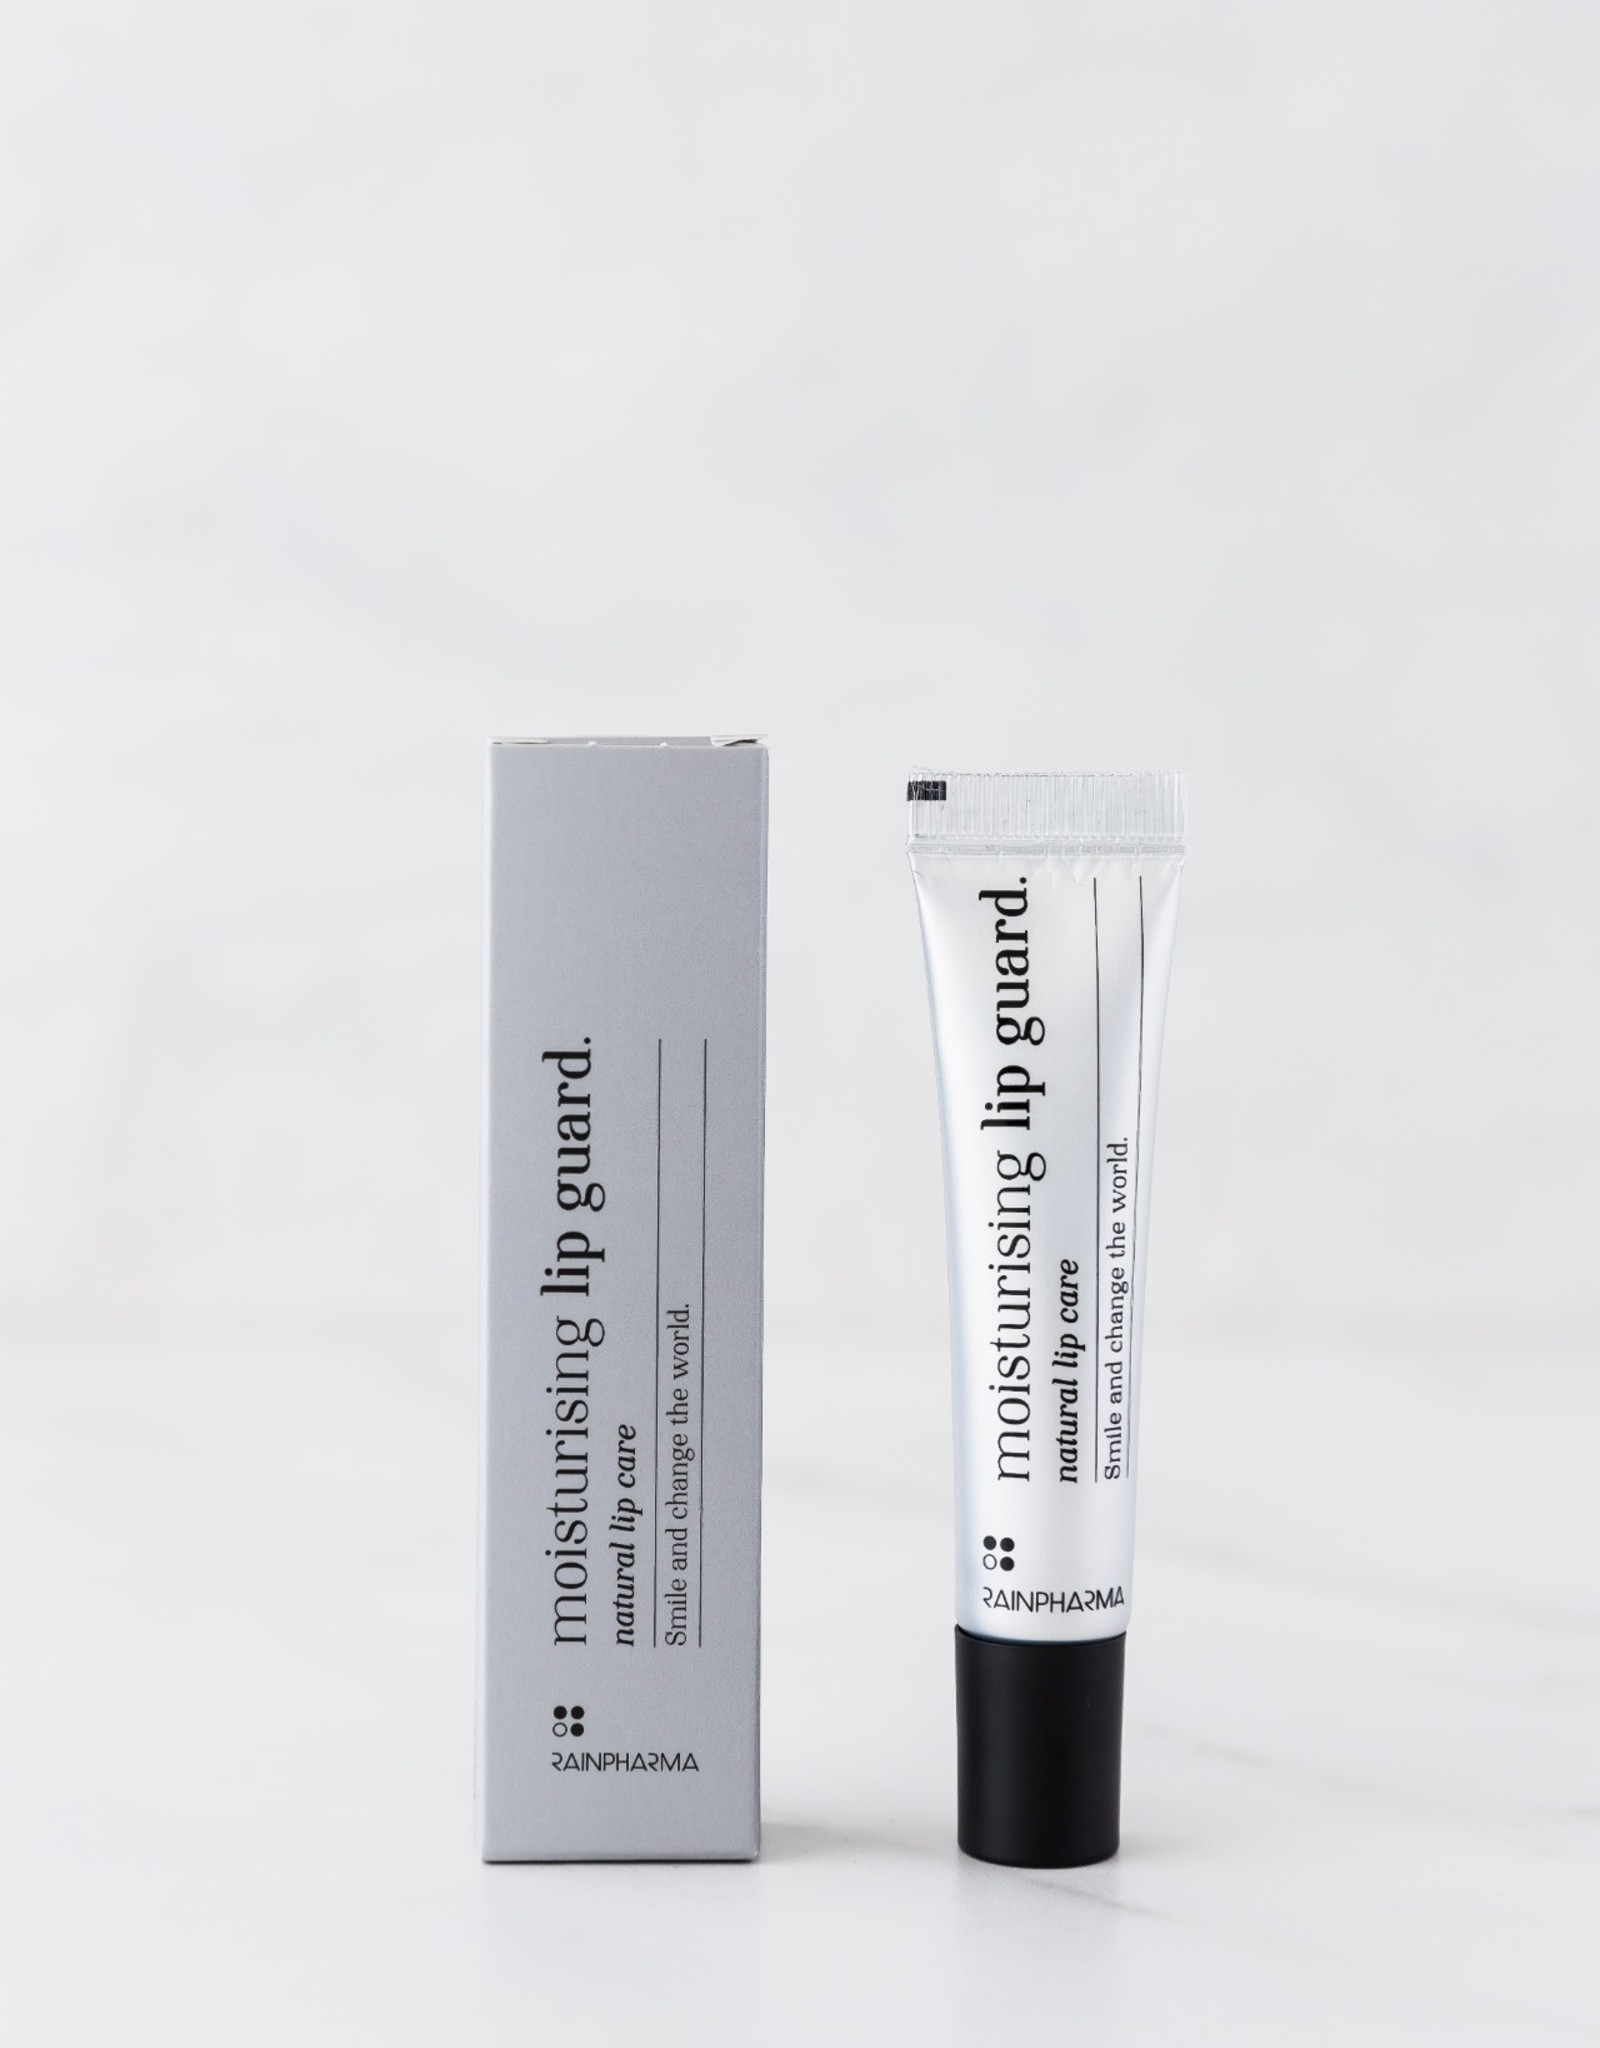 RainPharma Moisturising Lip Guard 15 ml - Rainpharma